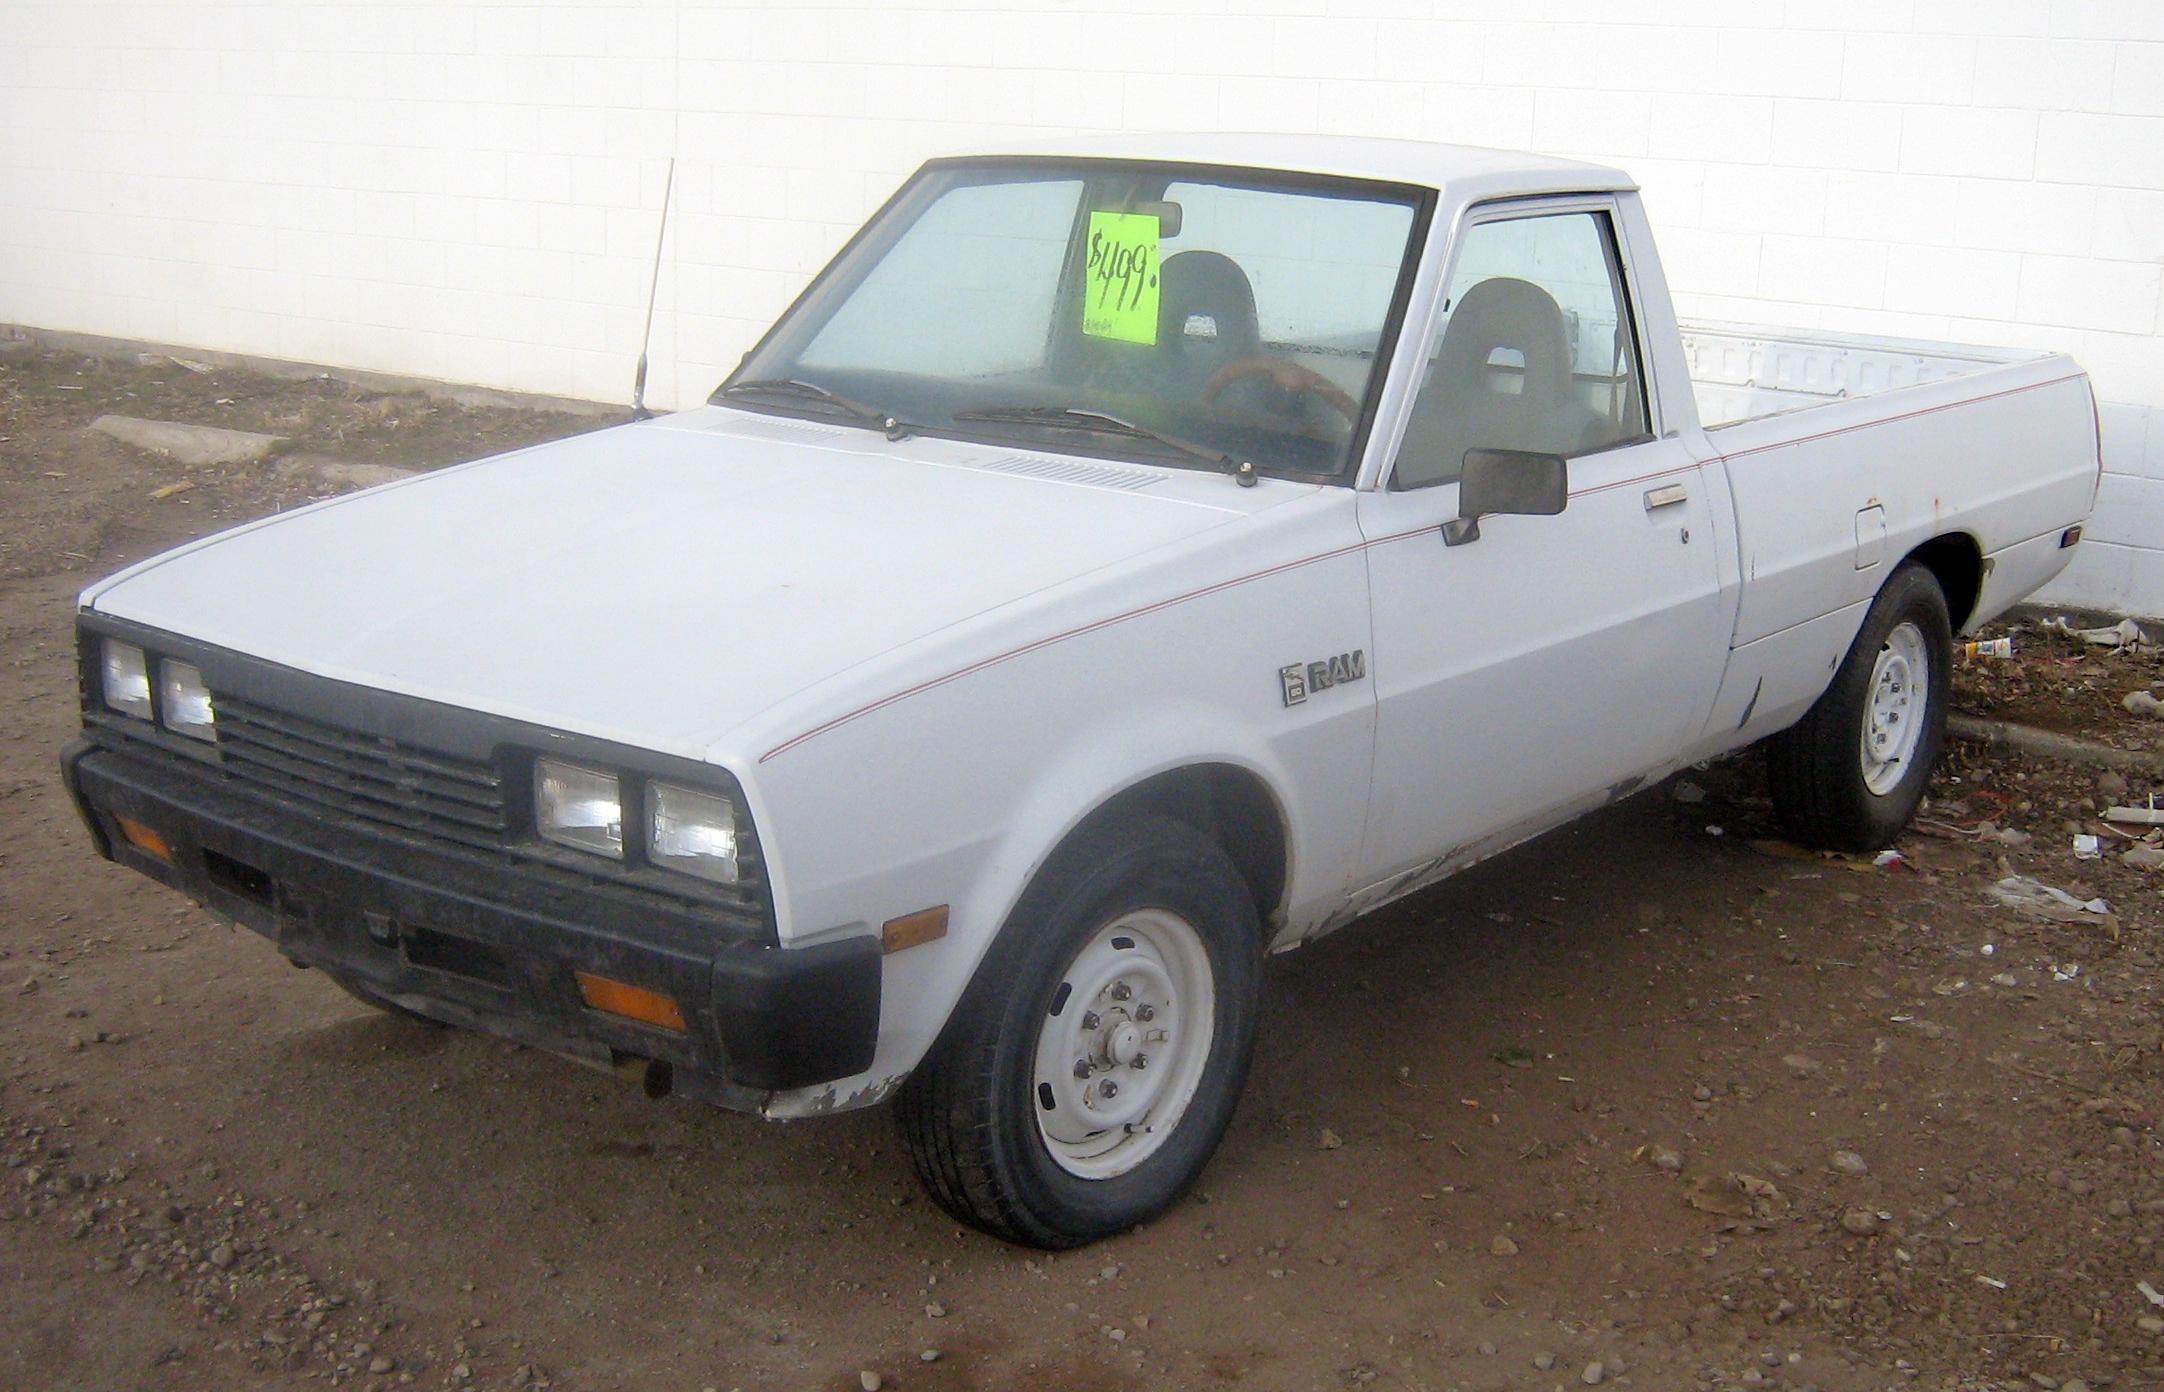 1992 dodge ram 50 pickup size 1 7 mb resolution 2164x1392 type link file src